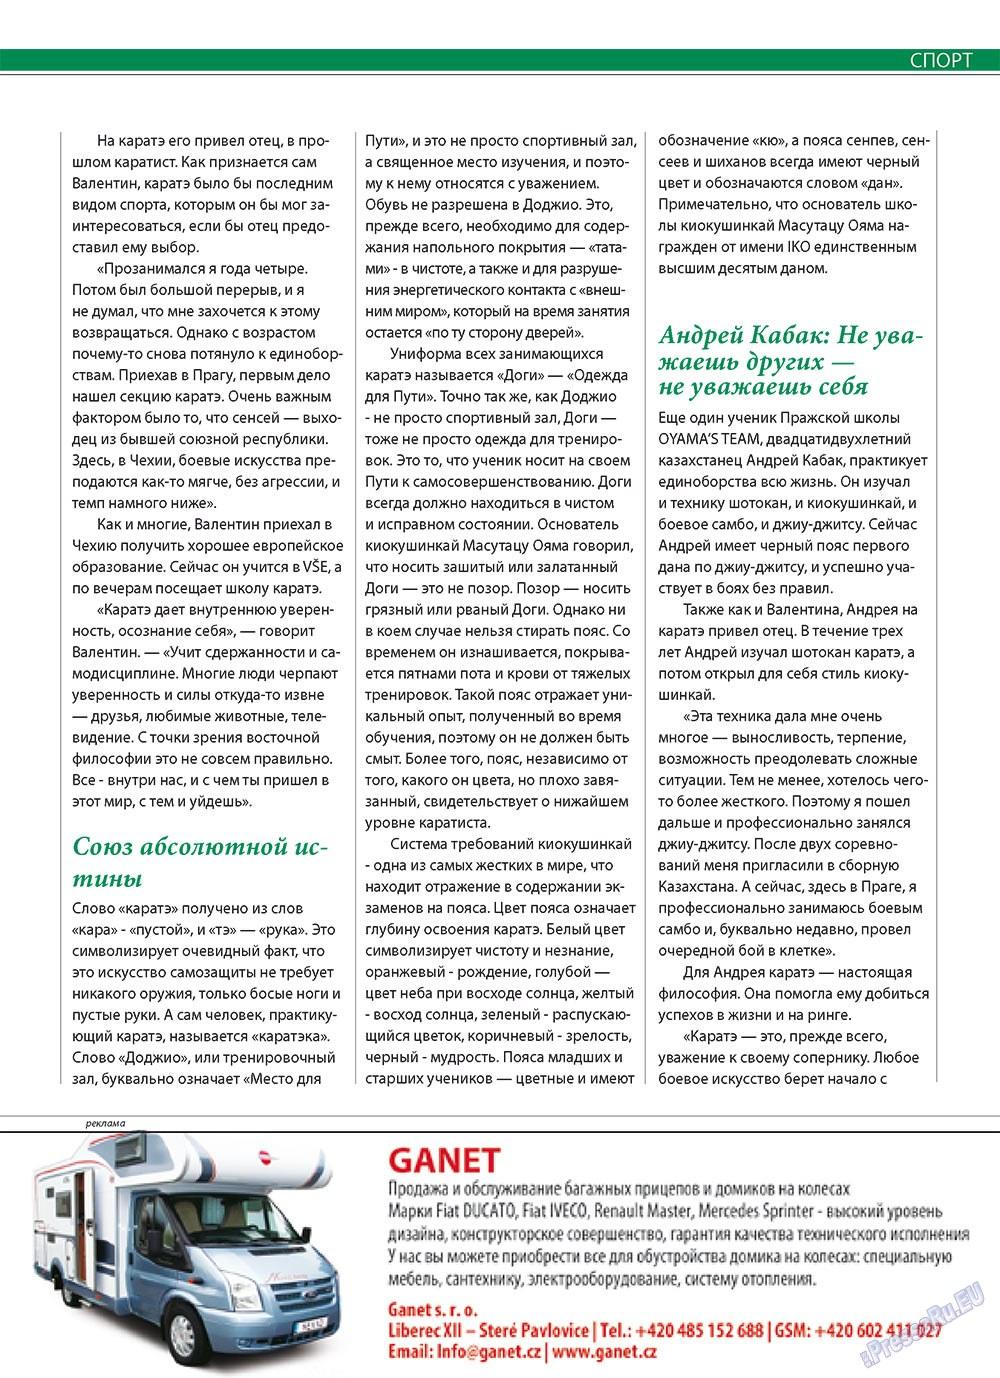 Артек (журнал). 2010 год, номер 5, стр. 31